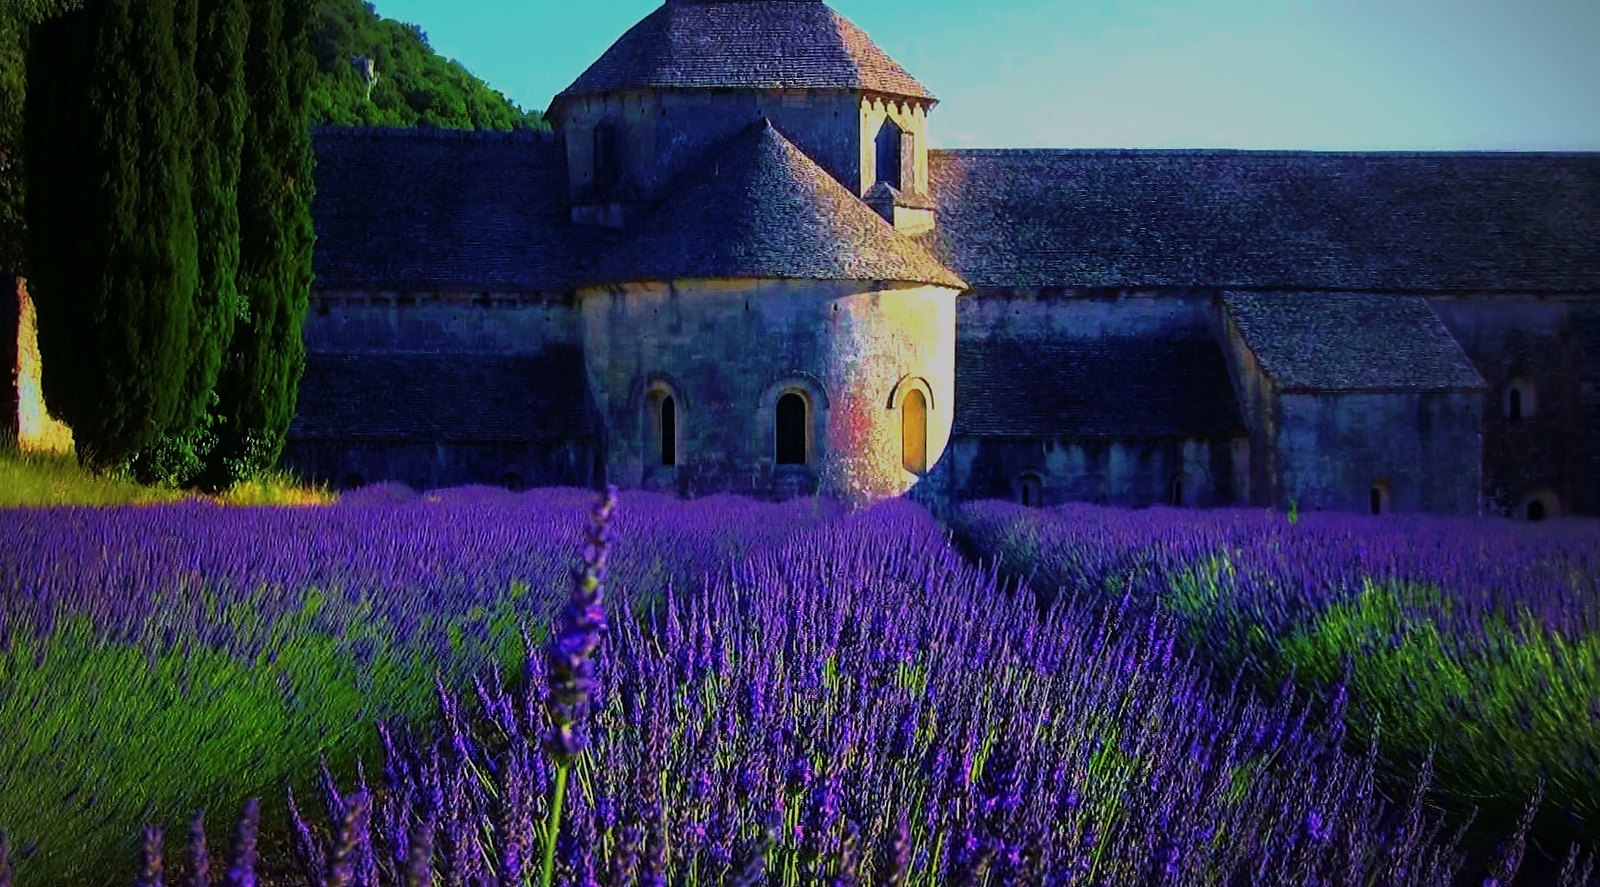 FRANCE - Provence, Abtei de Sénanque, 12310/4456